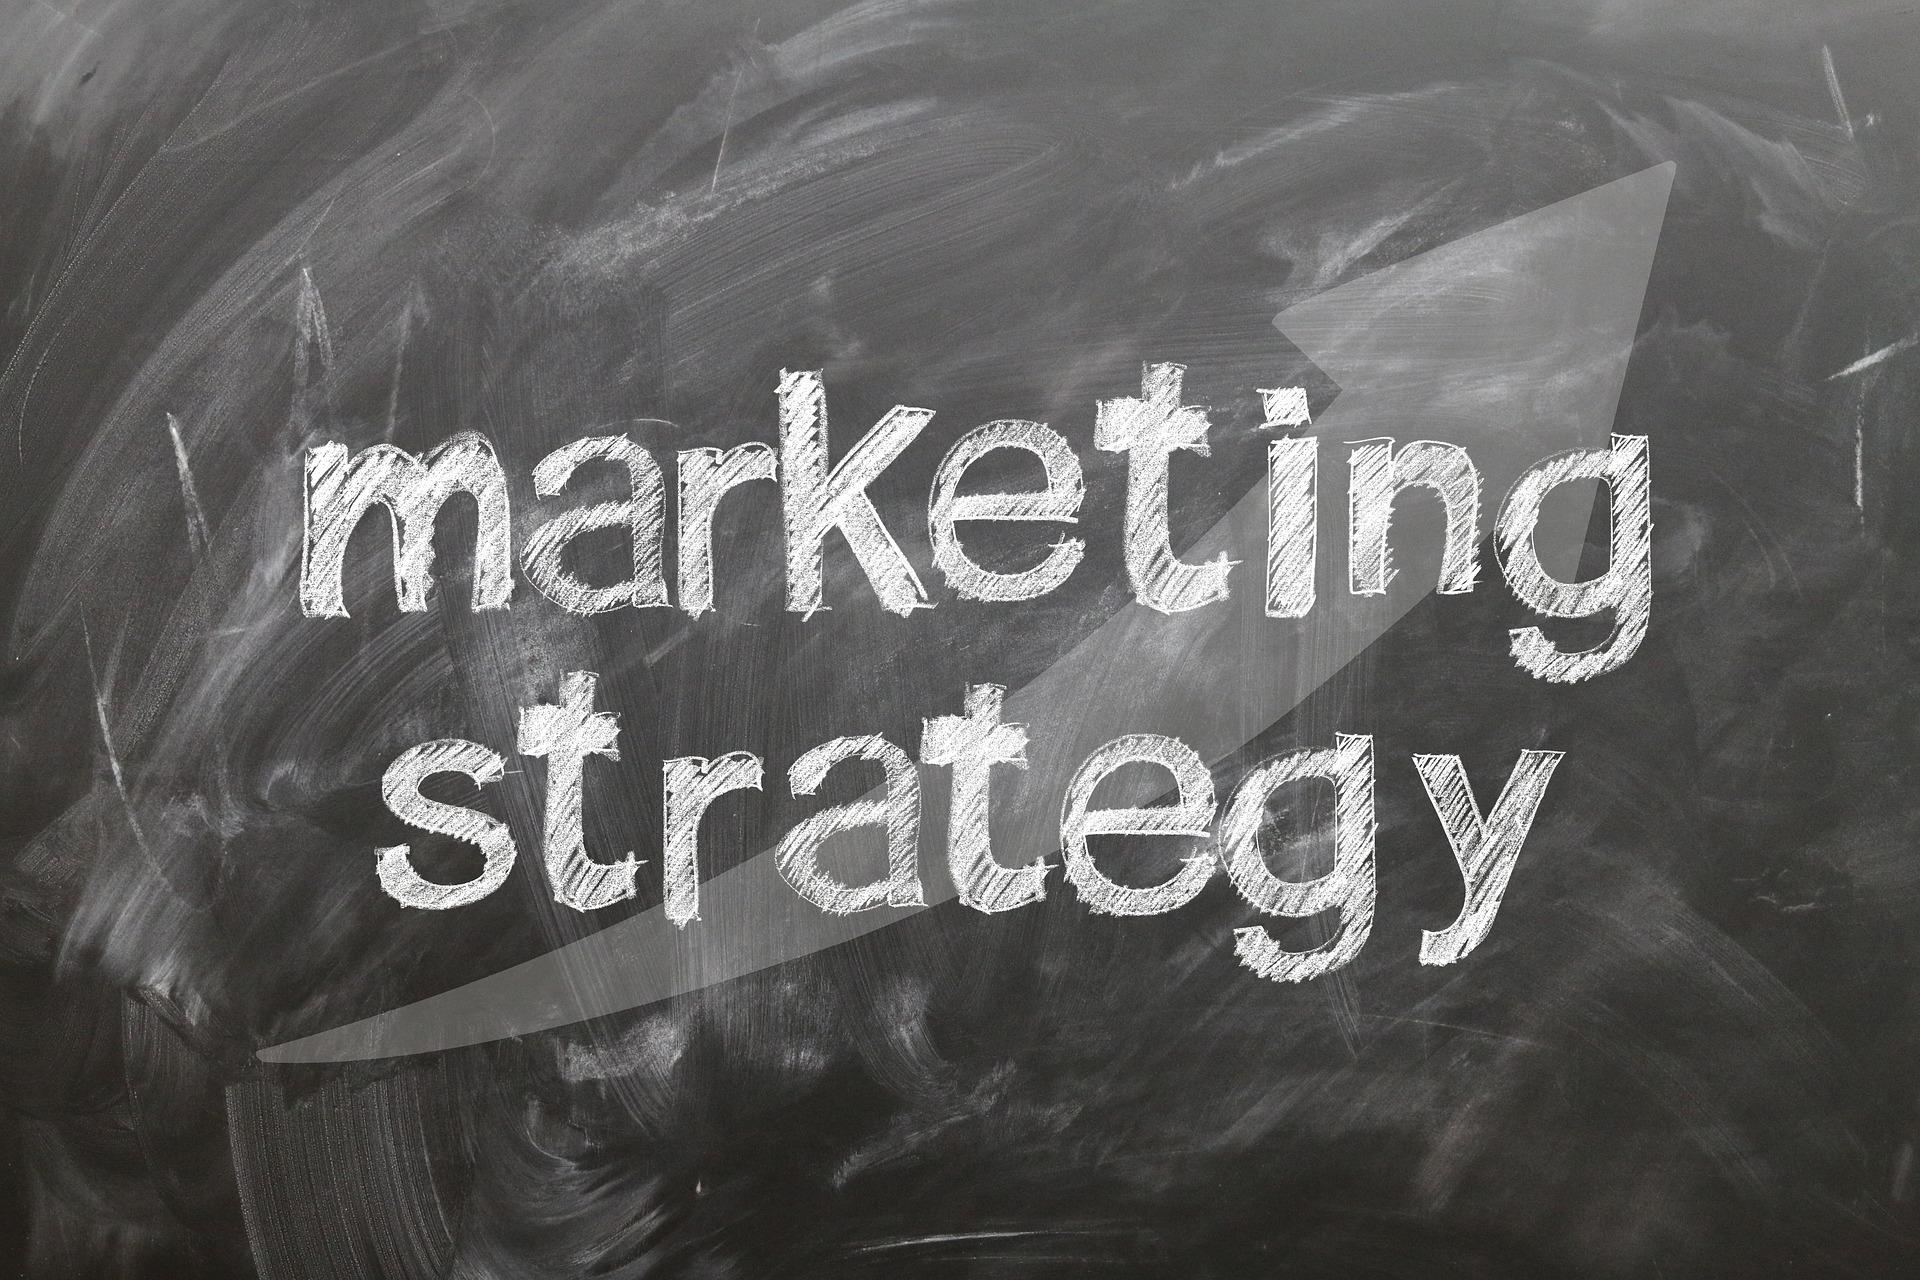 marketing-strategies-3105875_1920